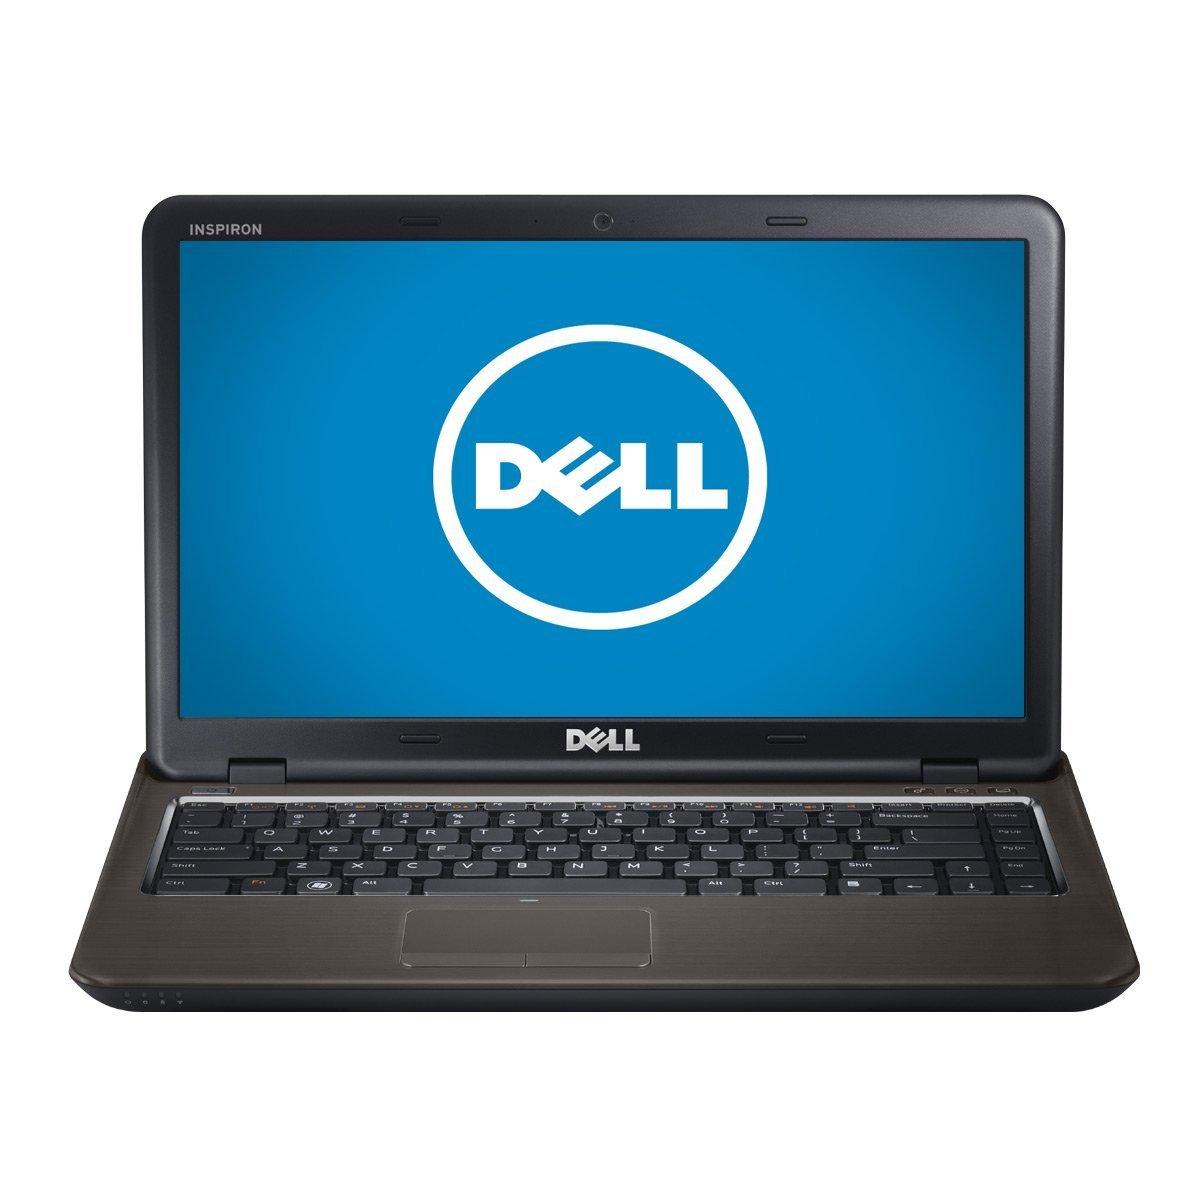 http://thetechjournal.com/wp-content/uploads/images/1204/1333304418-dell-inspiron-i14z2877bk-14inch-laptop-3.jpg